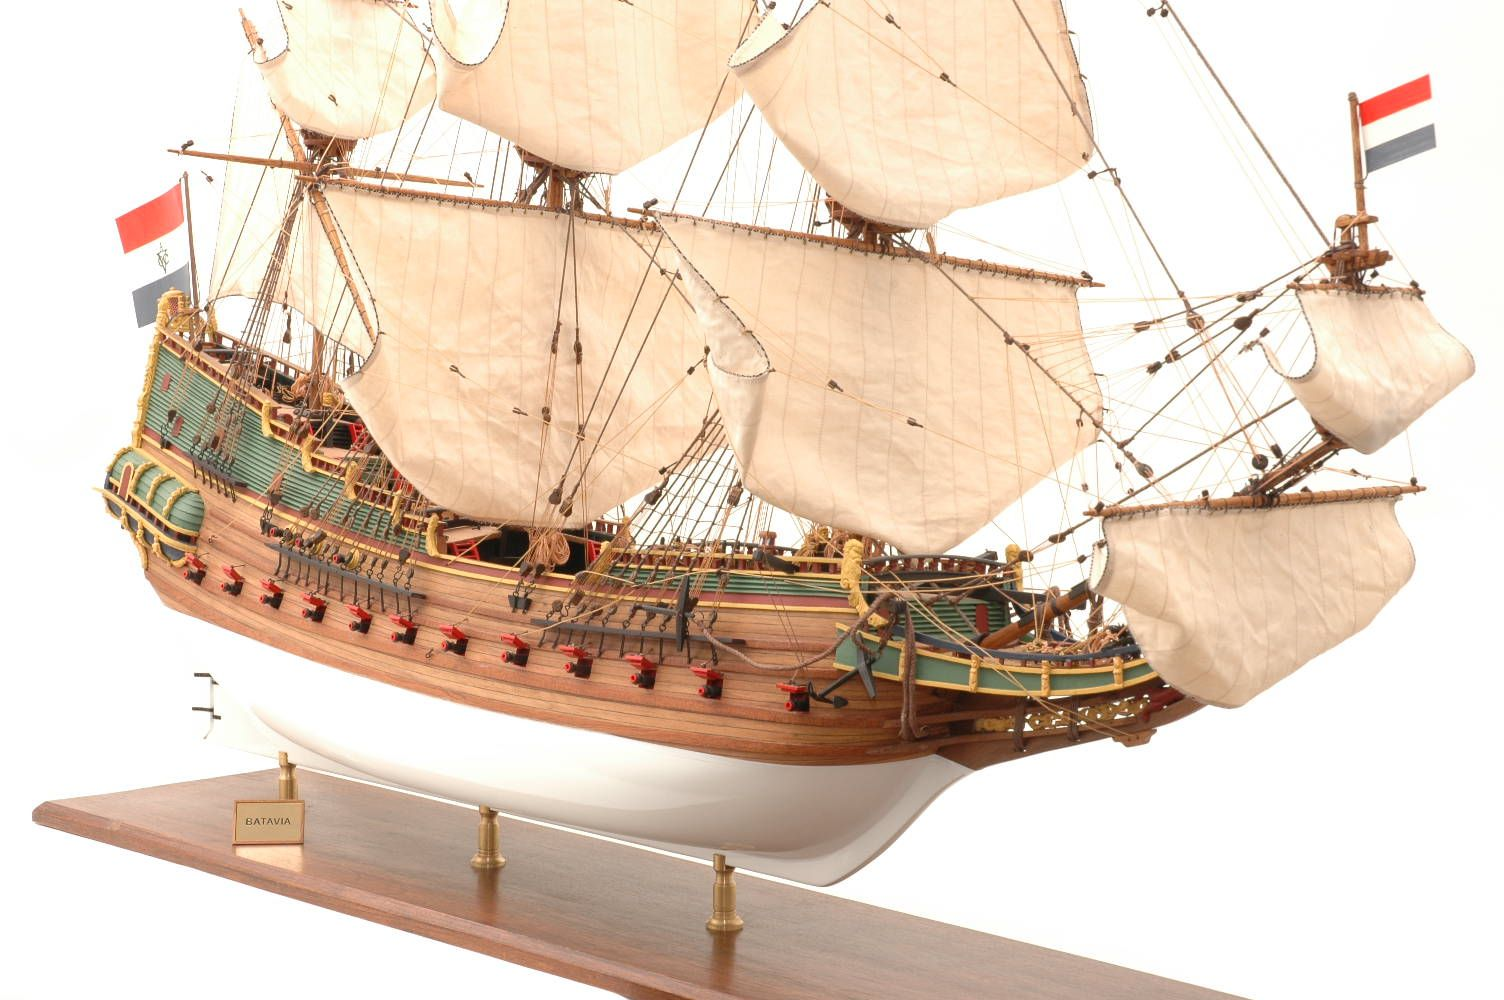 228-6953-Batavia-model-ship-Premier-Range